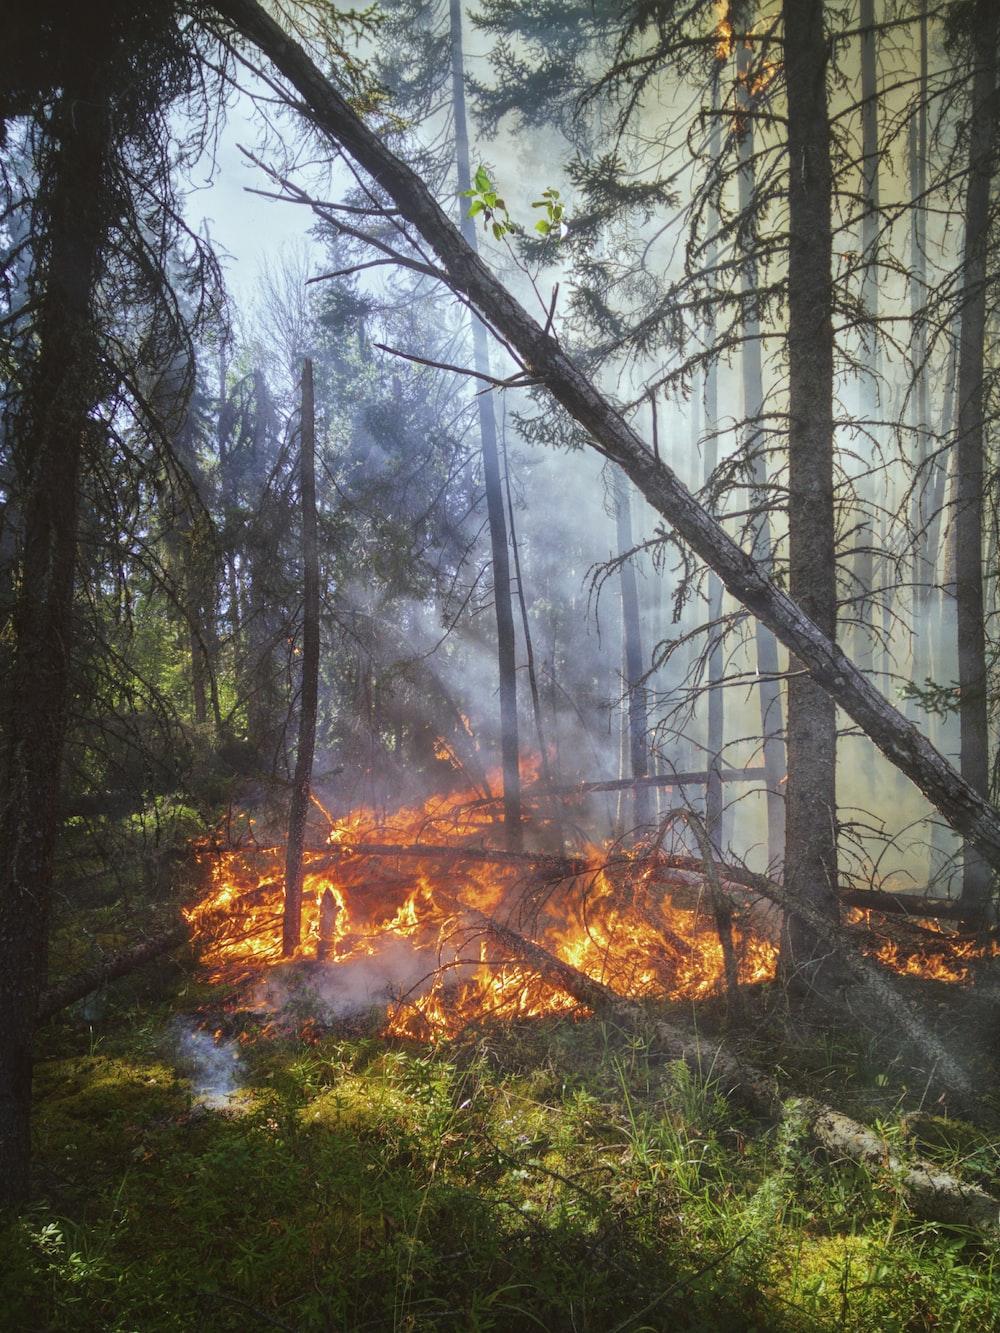 burning woods during night time